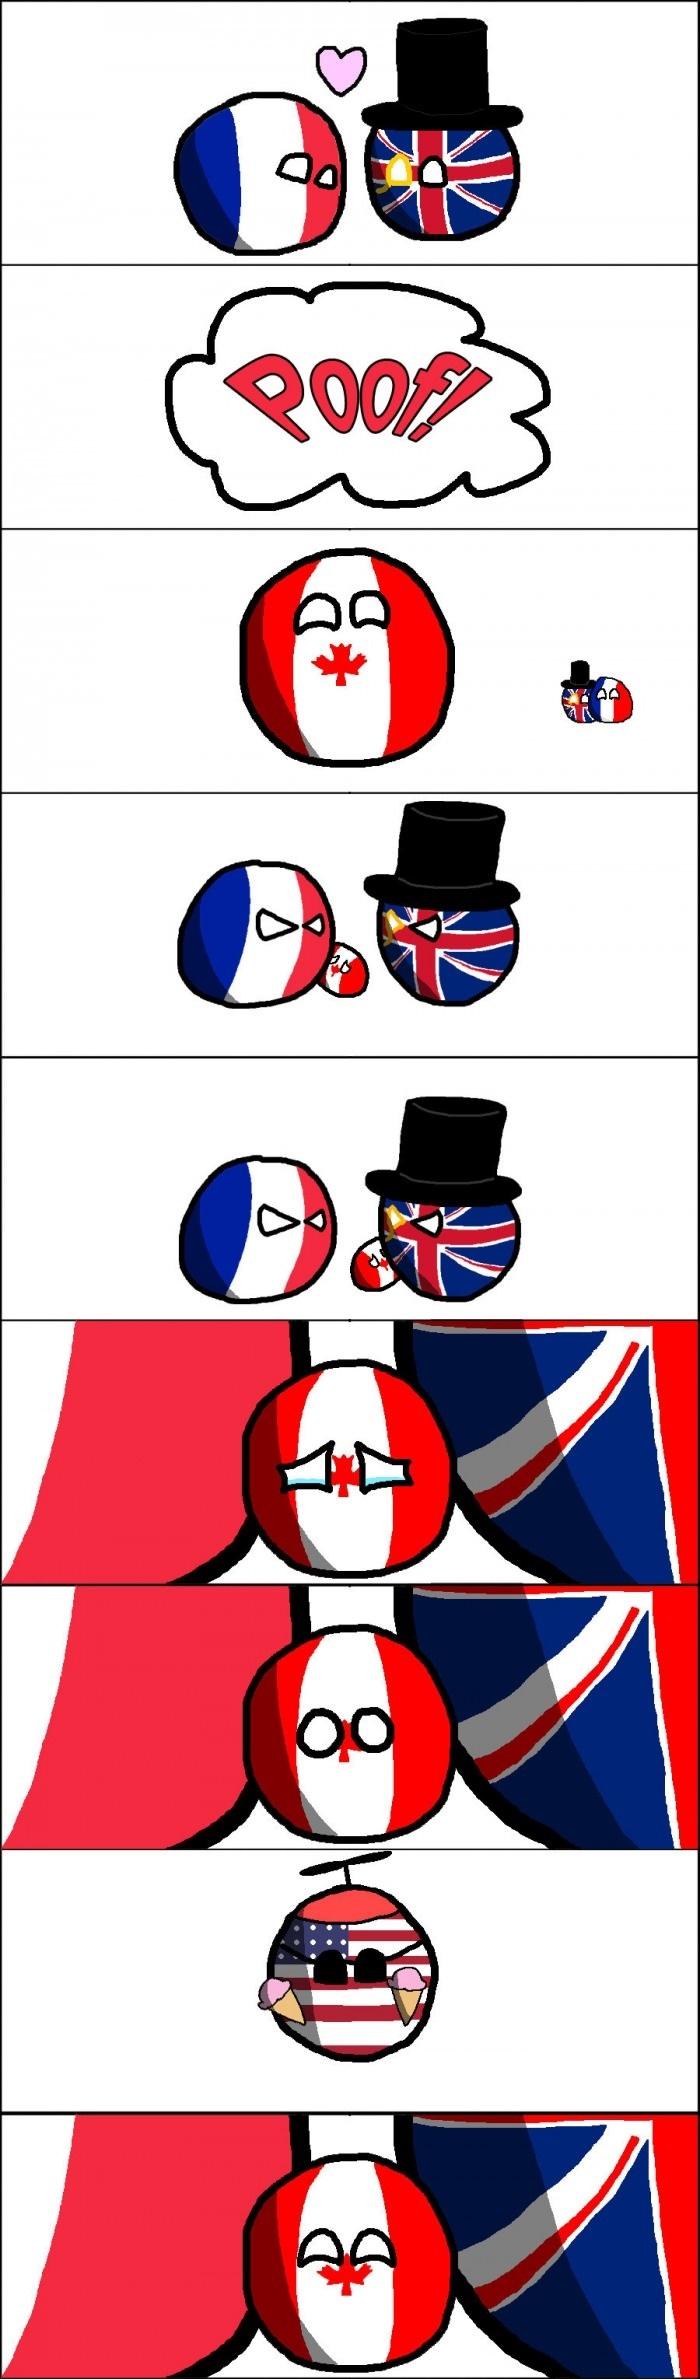 Canada had a rough childhood